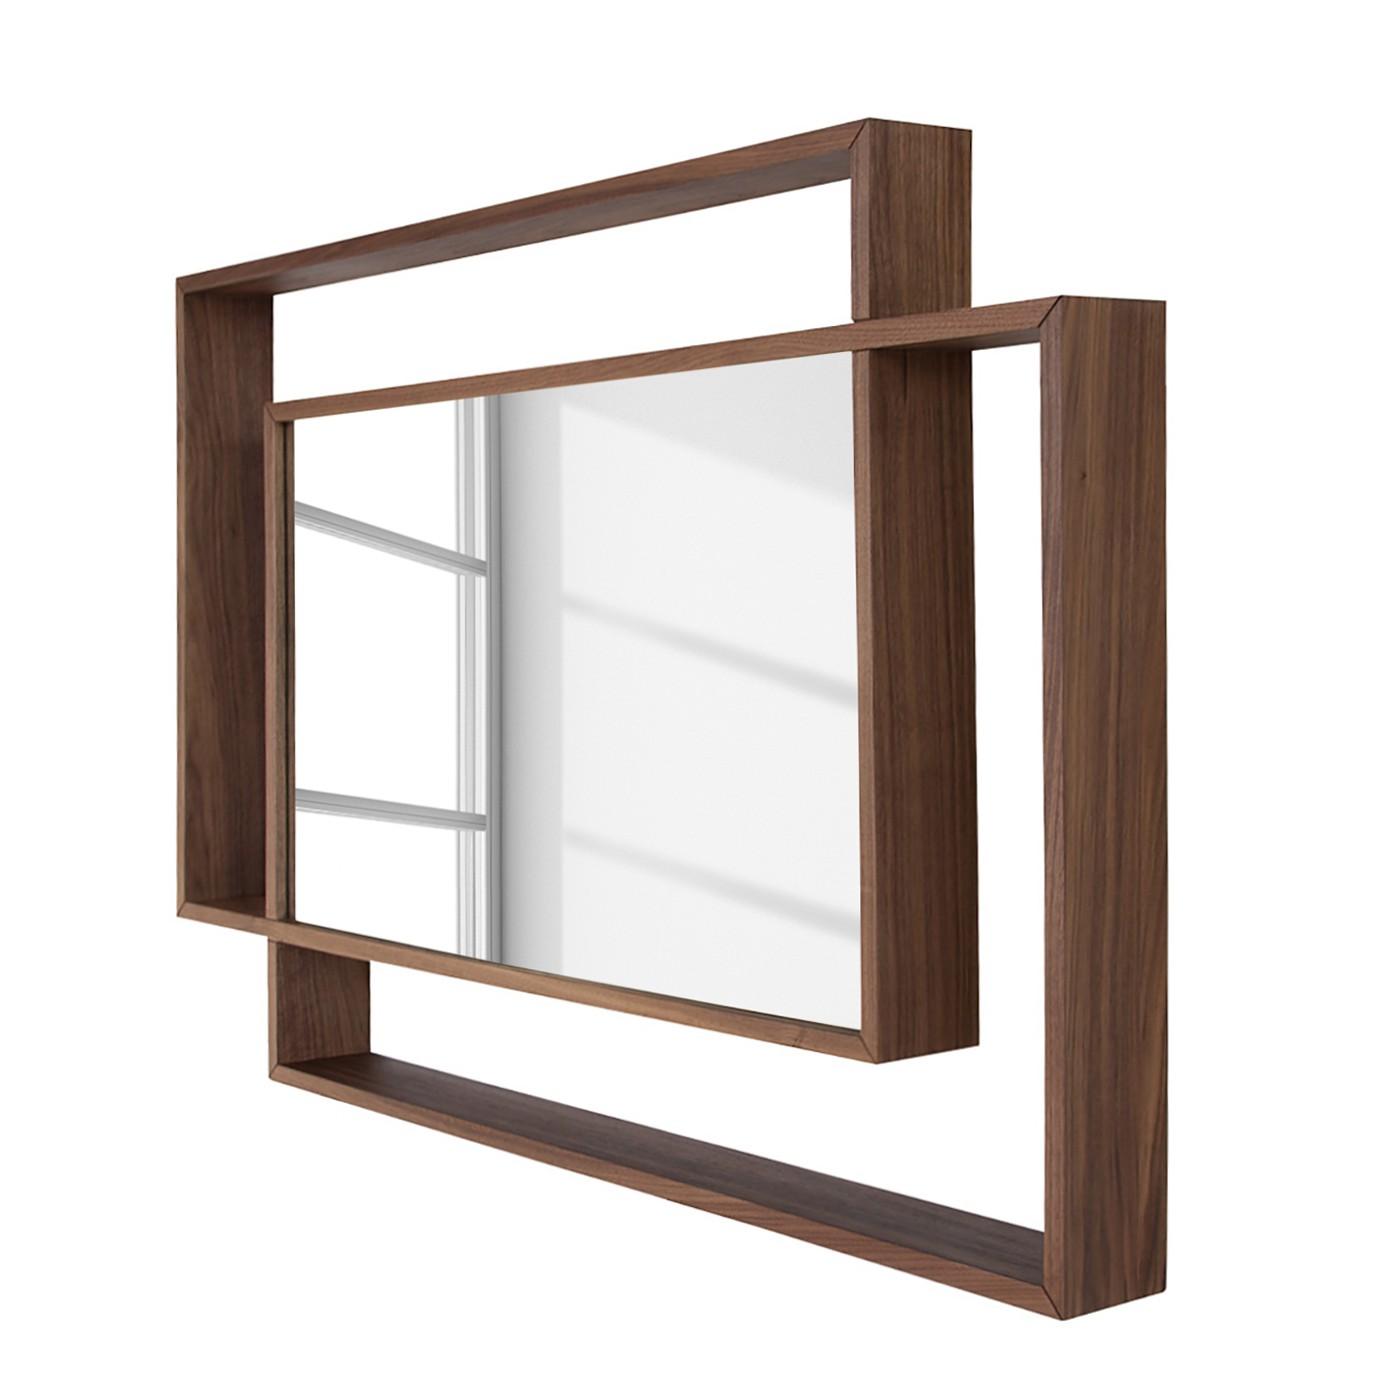 Home24 kleinmeubels - Home24 spiegel ...